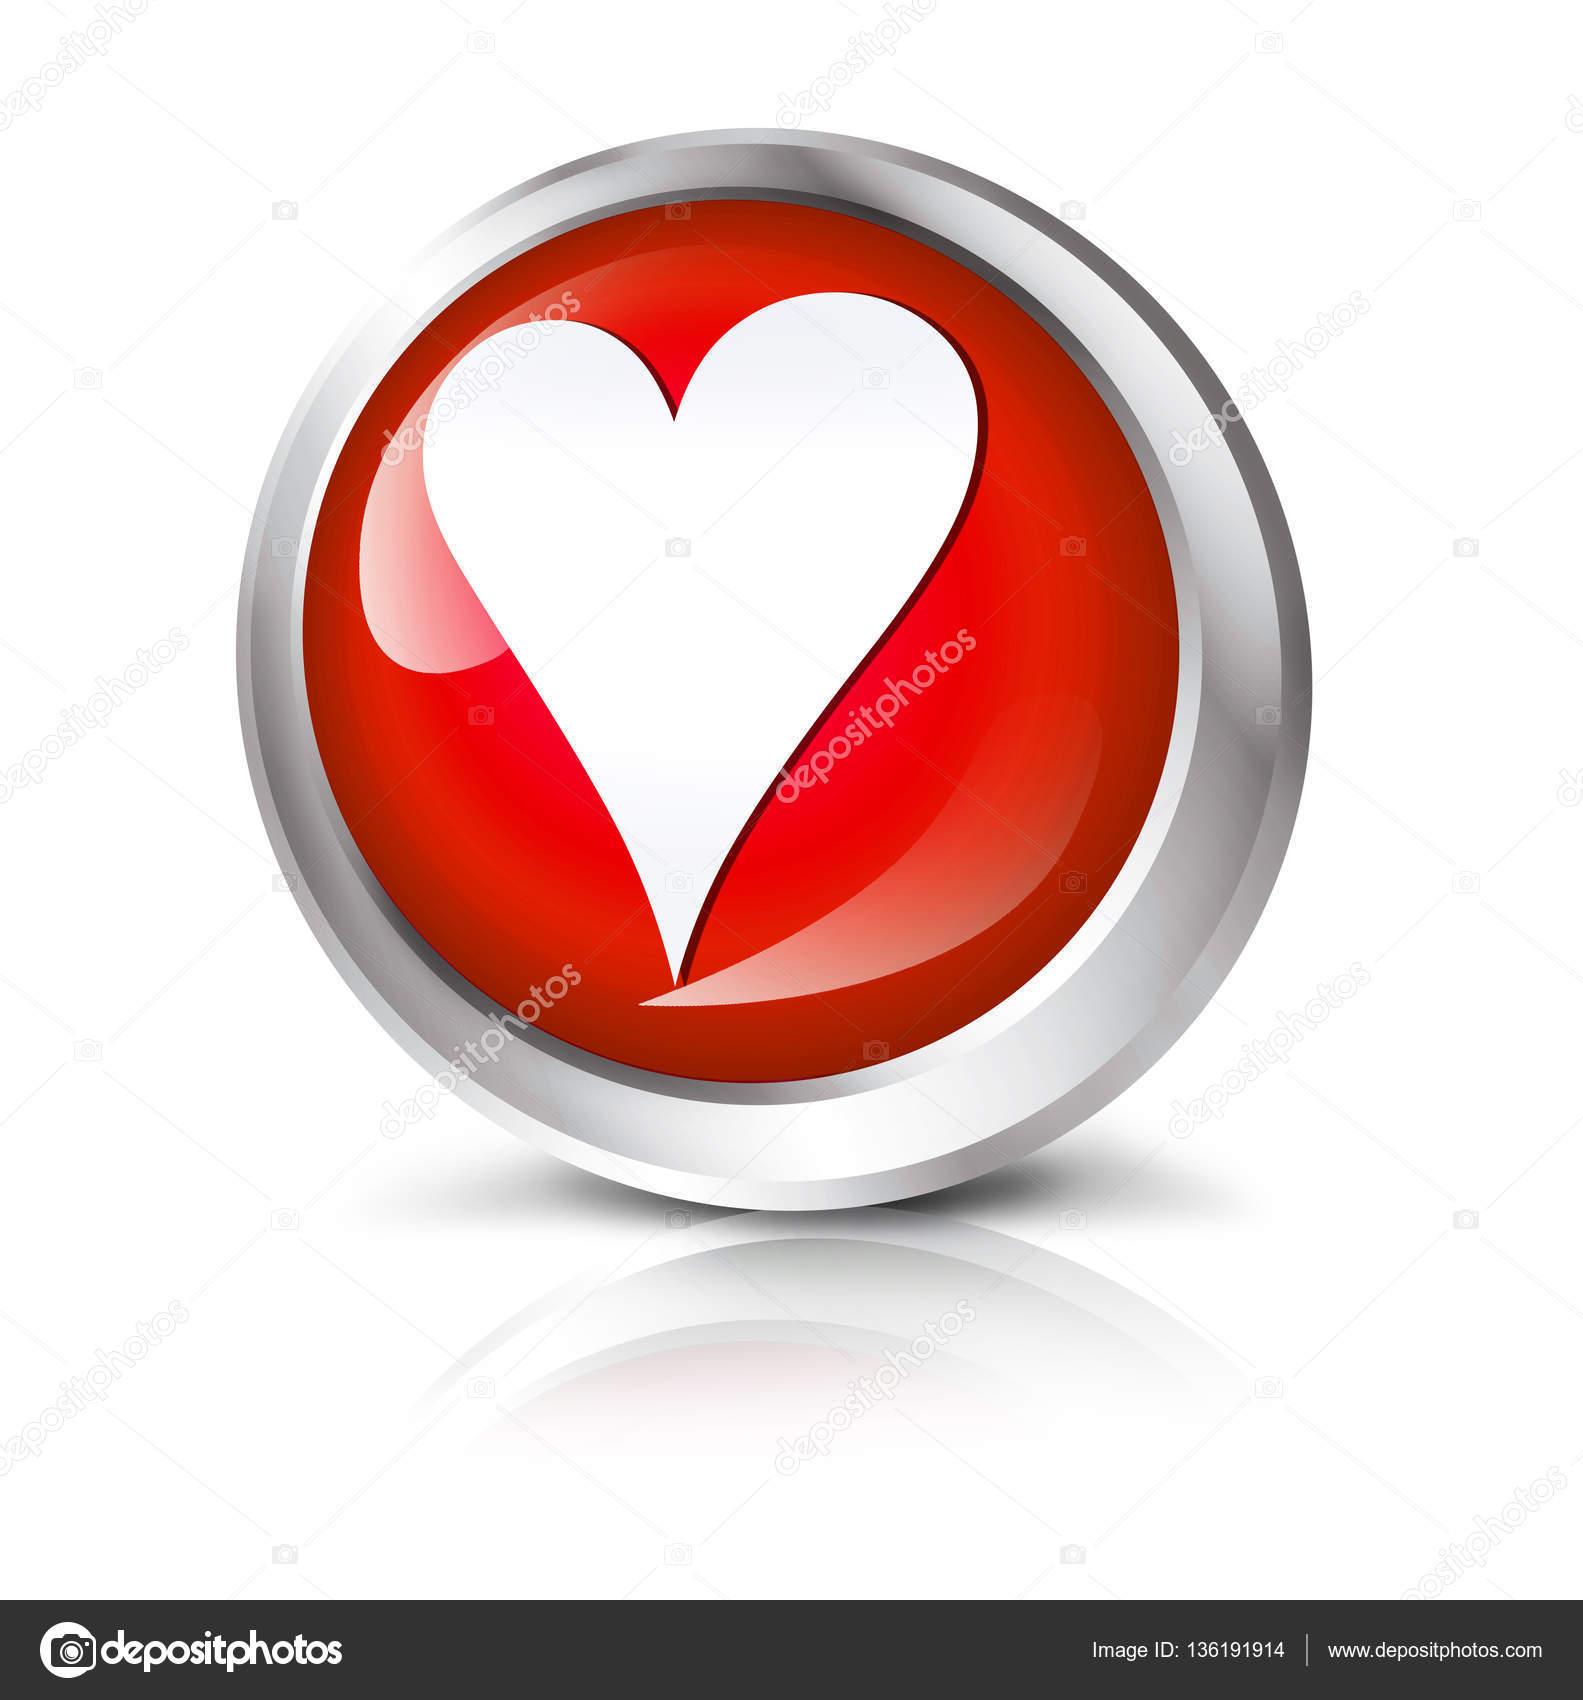 Computer icon with heart symbol stock photo eivaisla 136191914 glossy red vector icm with shadow isolated on white background computer icon with heart symbol photo by eivaisla buycottarizona Choice Image